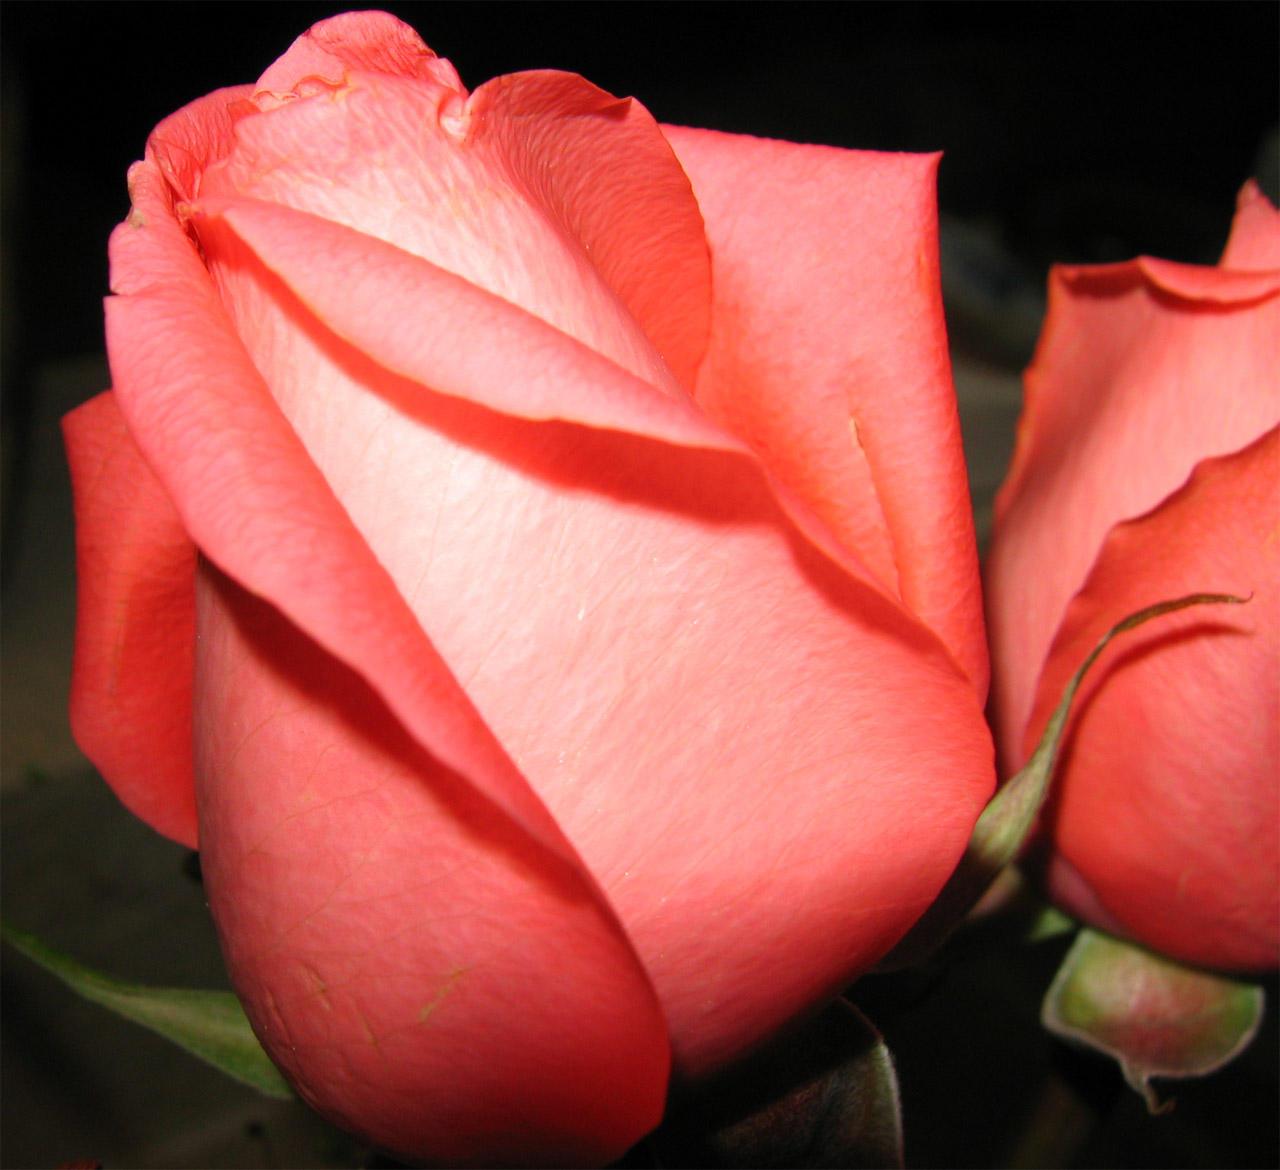 i love you rose wallpaper download